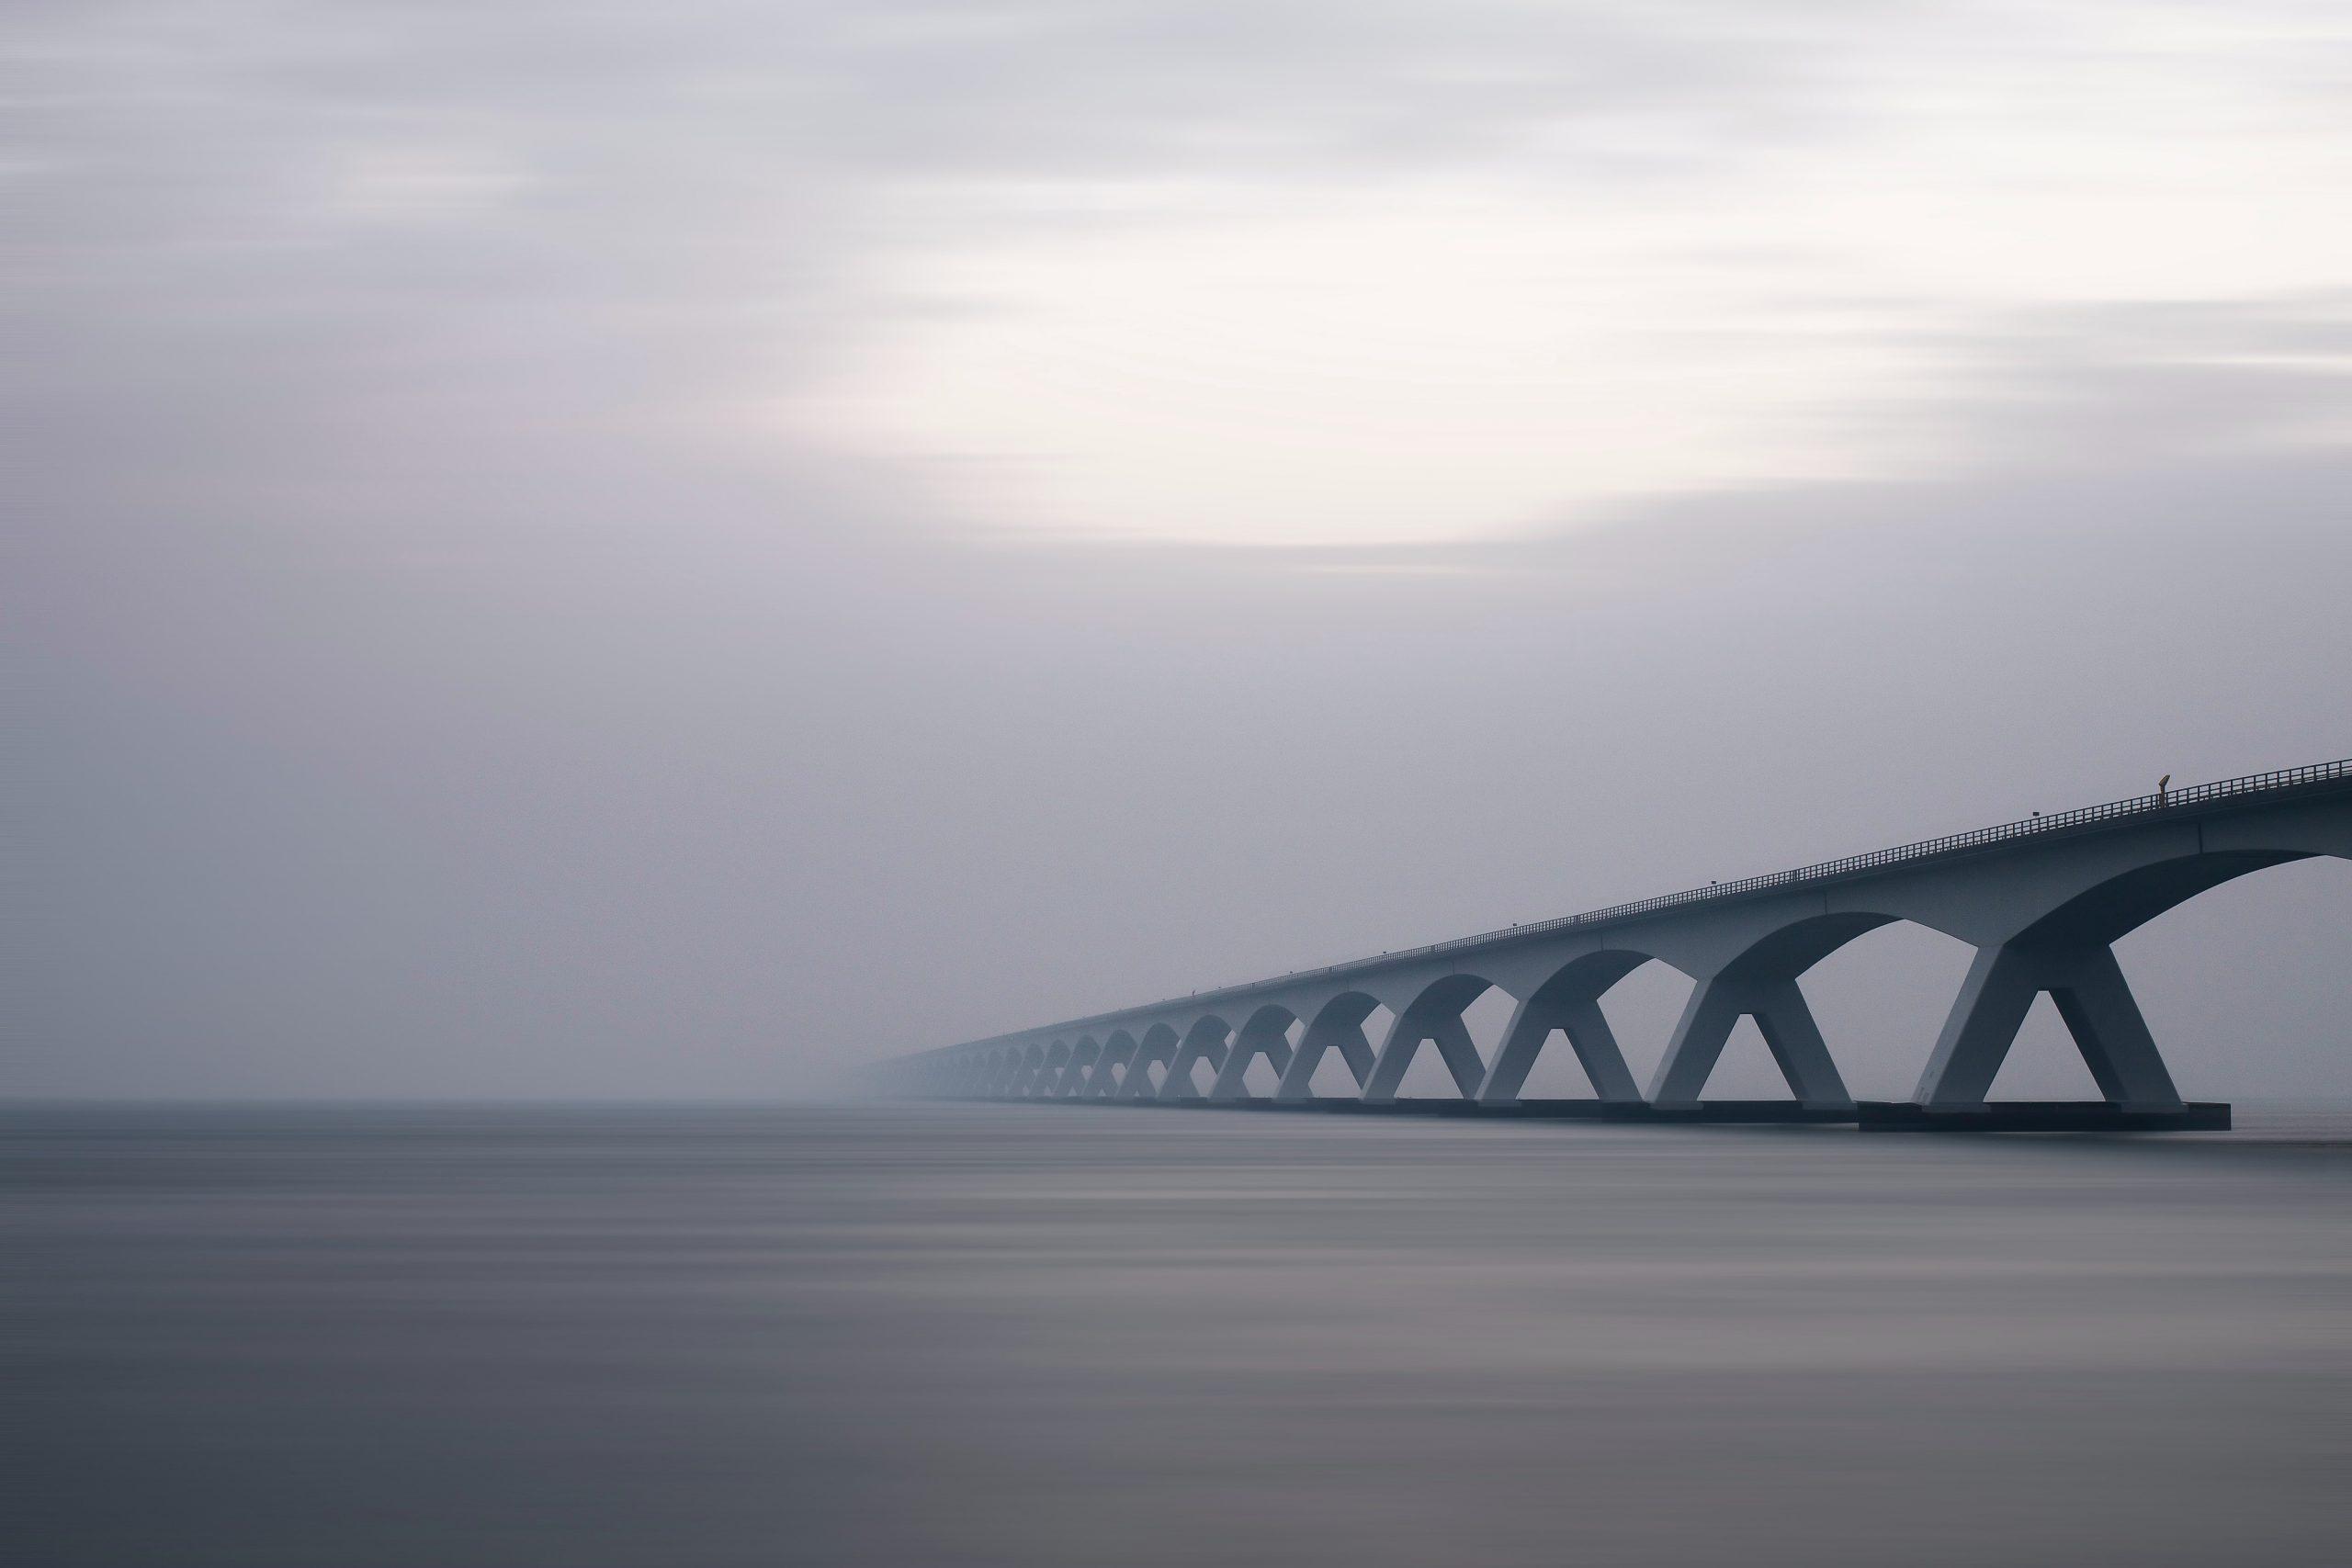 Maldives bridge project